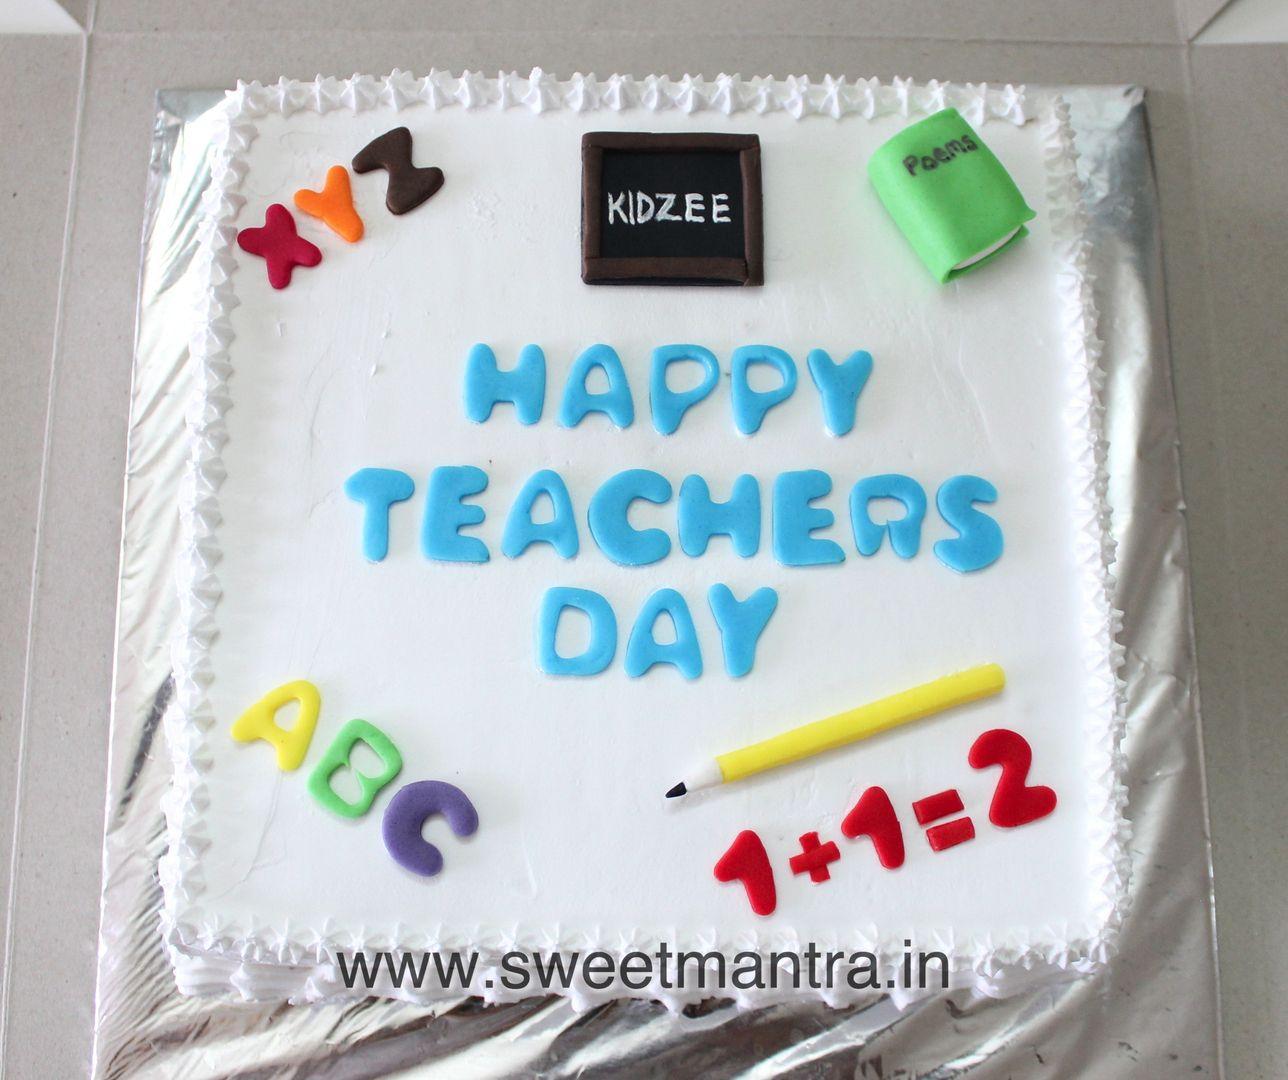 Order Send Eggless Fondant Custom Theme Cakes Delivery Pune Teacher Cakes Teachers Day Cake Teachers Day